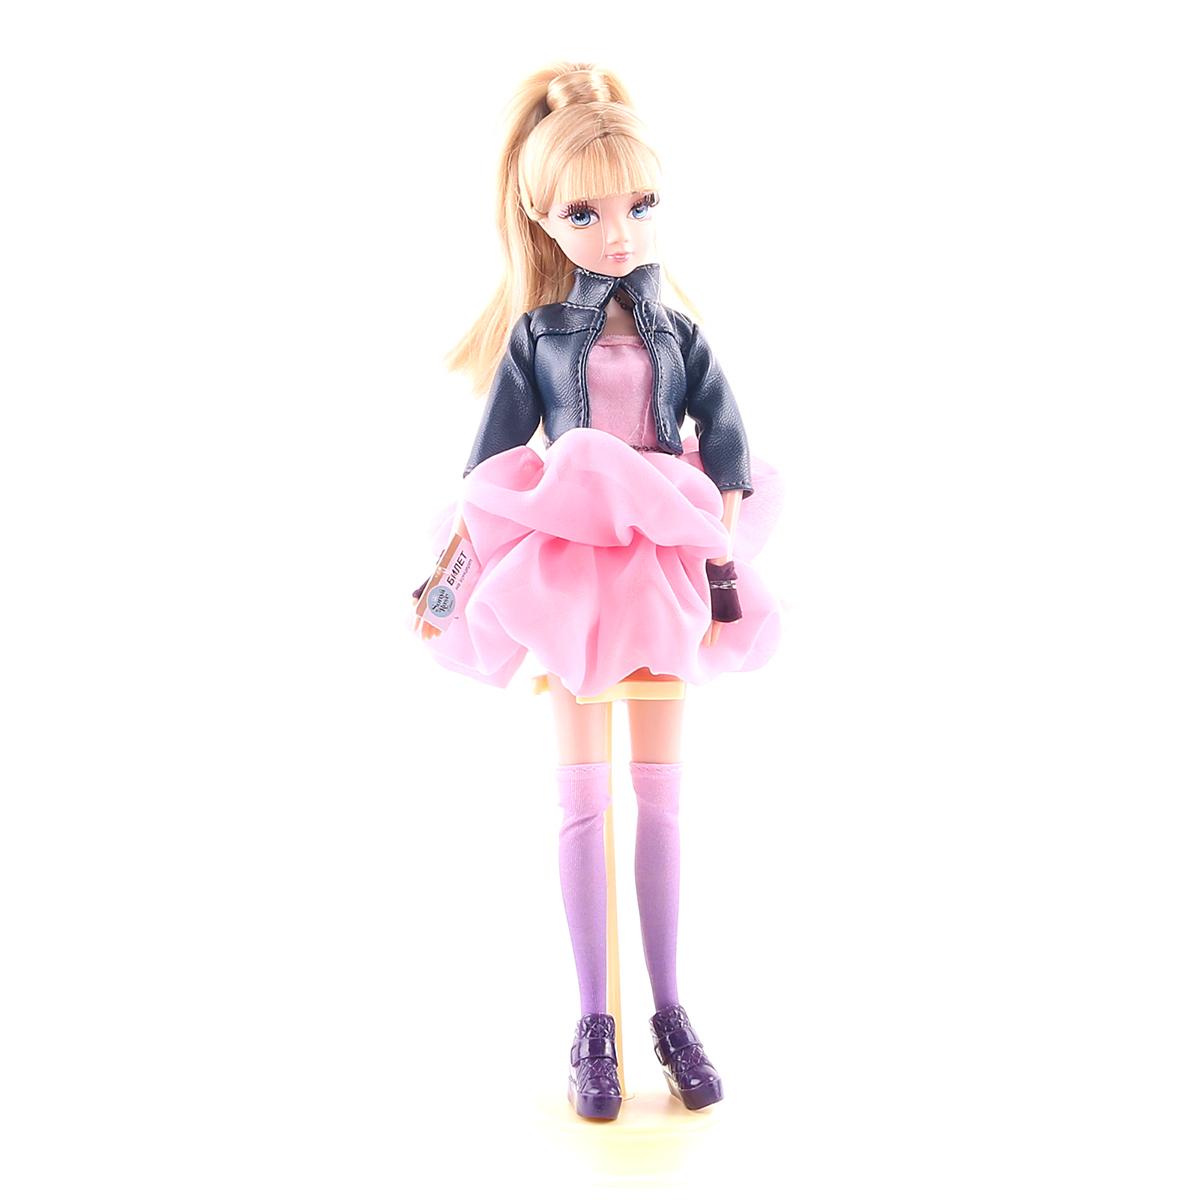 Кукла SONYA Daily collection, Музыкальная вечеринка sonya rose кукла daily collection в кожаной куртке